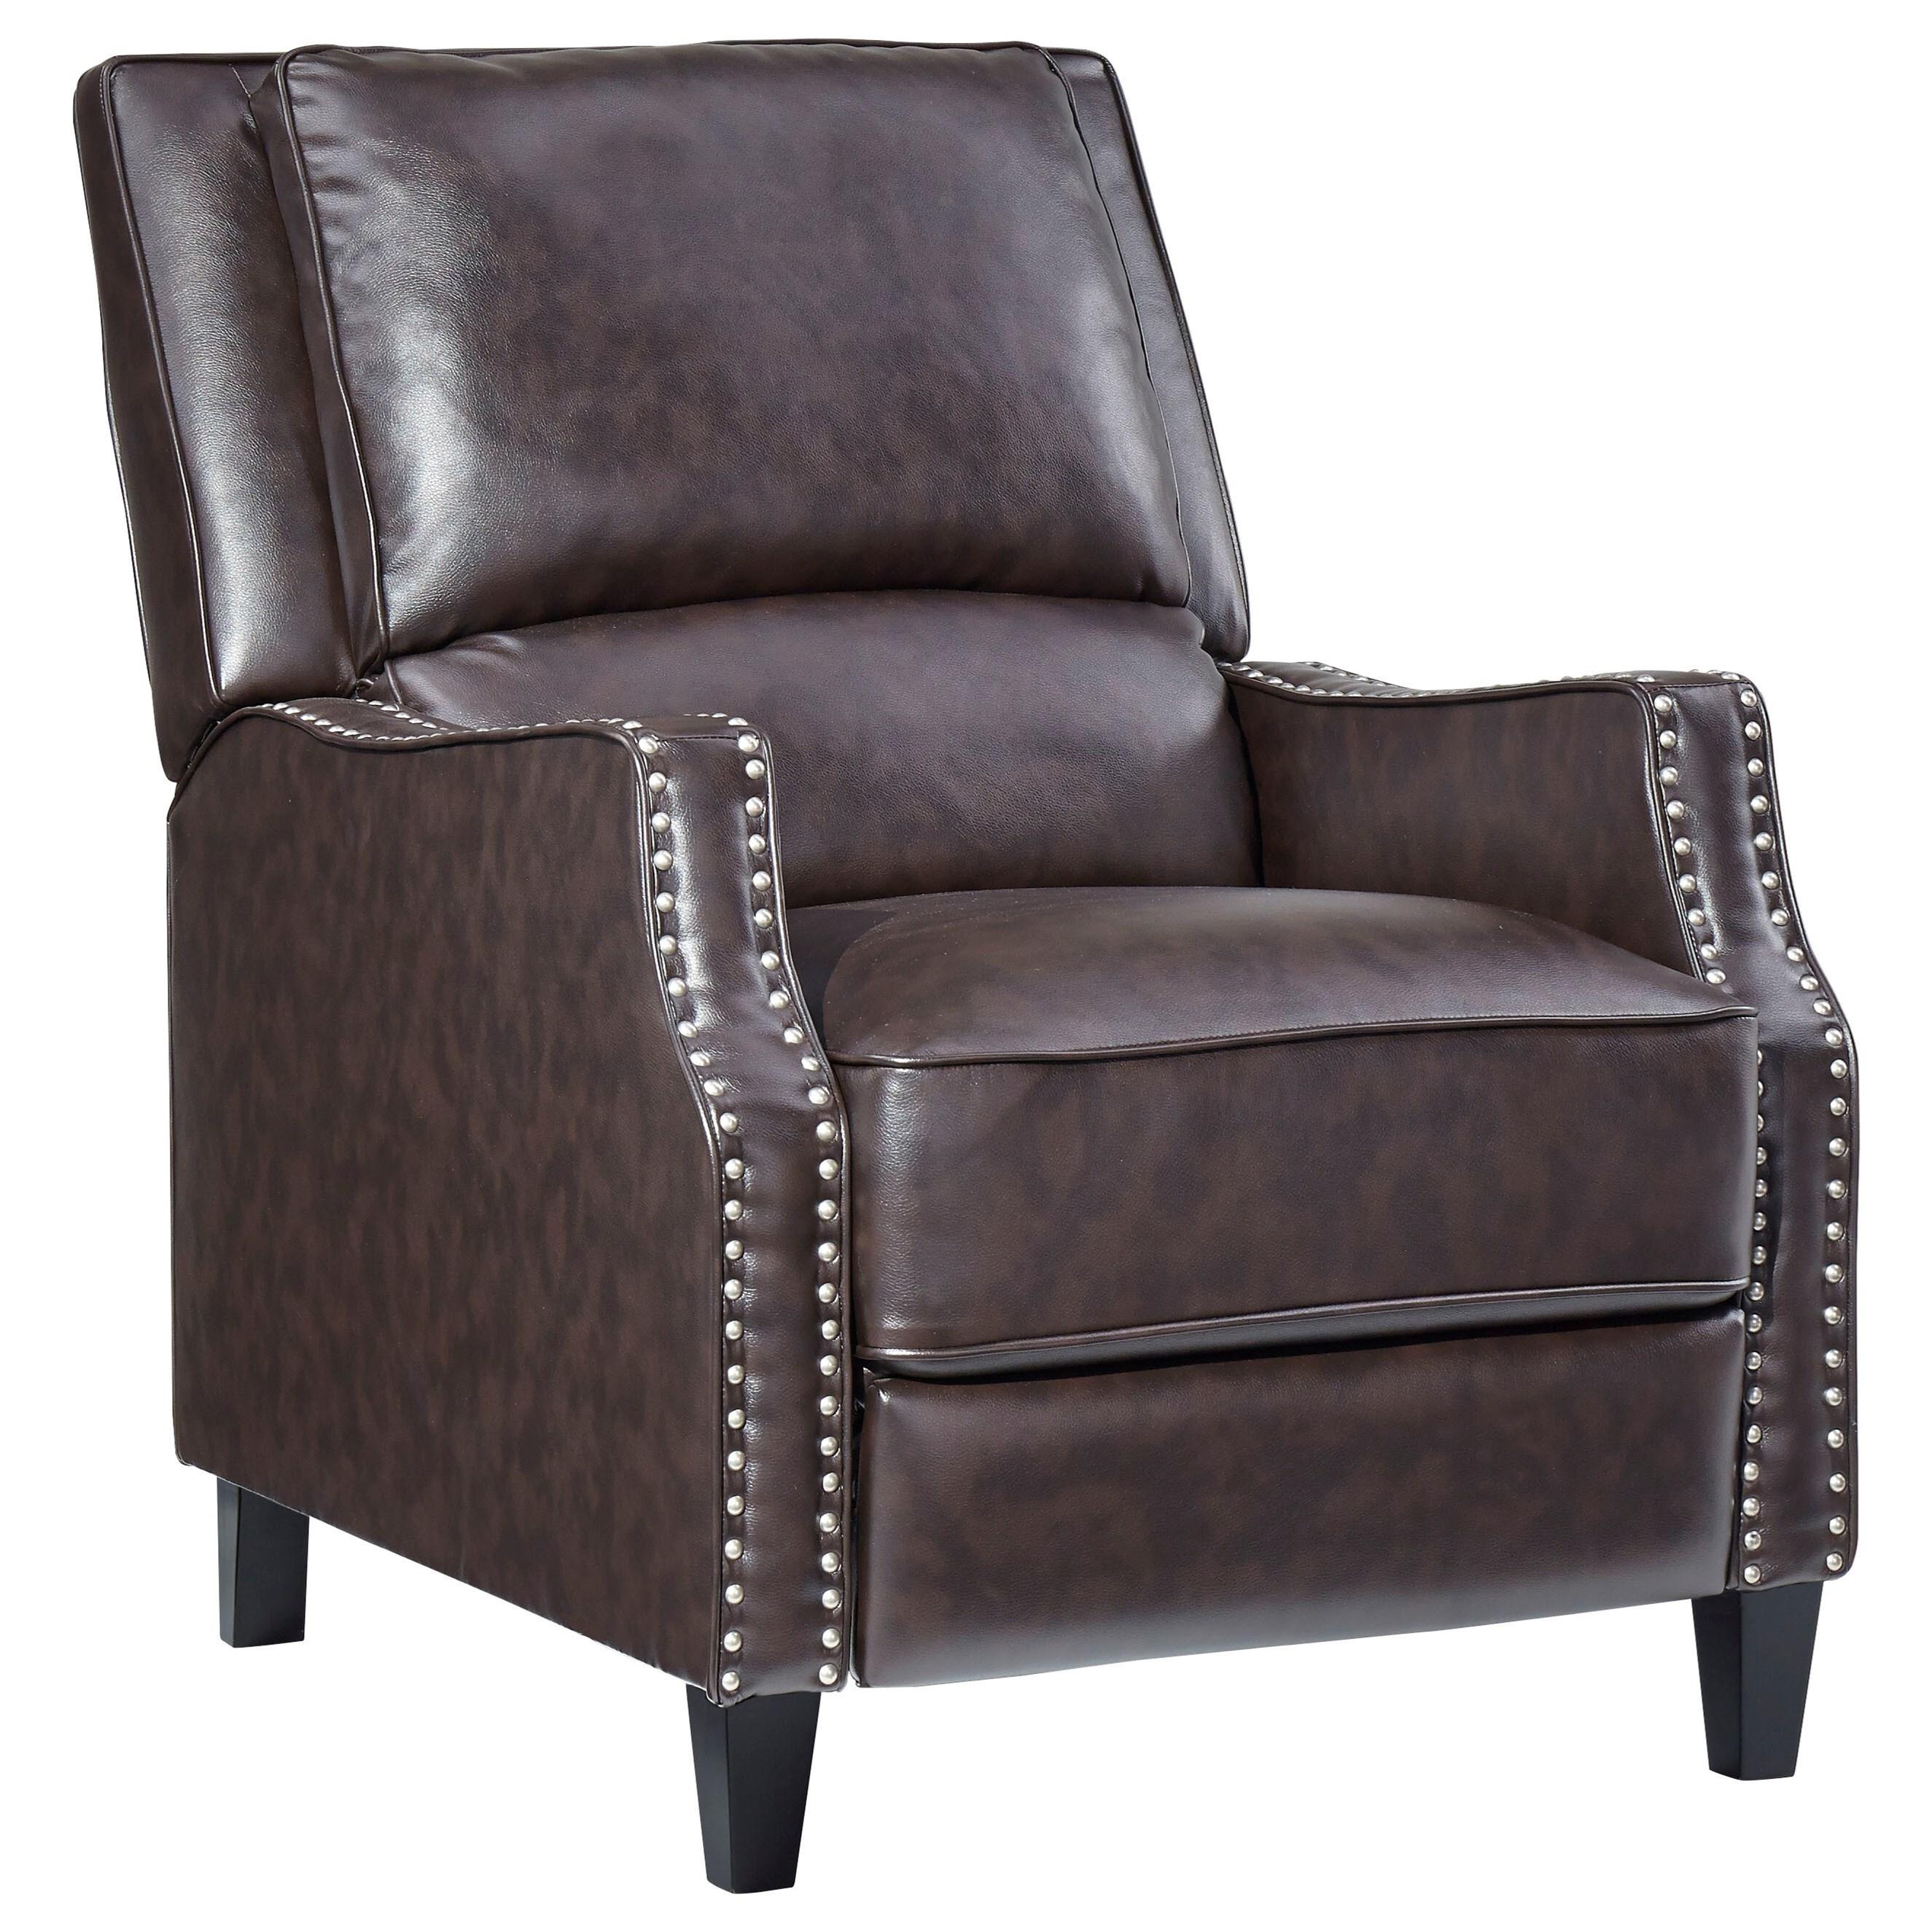 Alston Recliner by Standard Furniture at Darvin Furniture